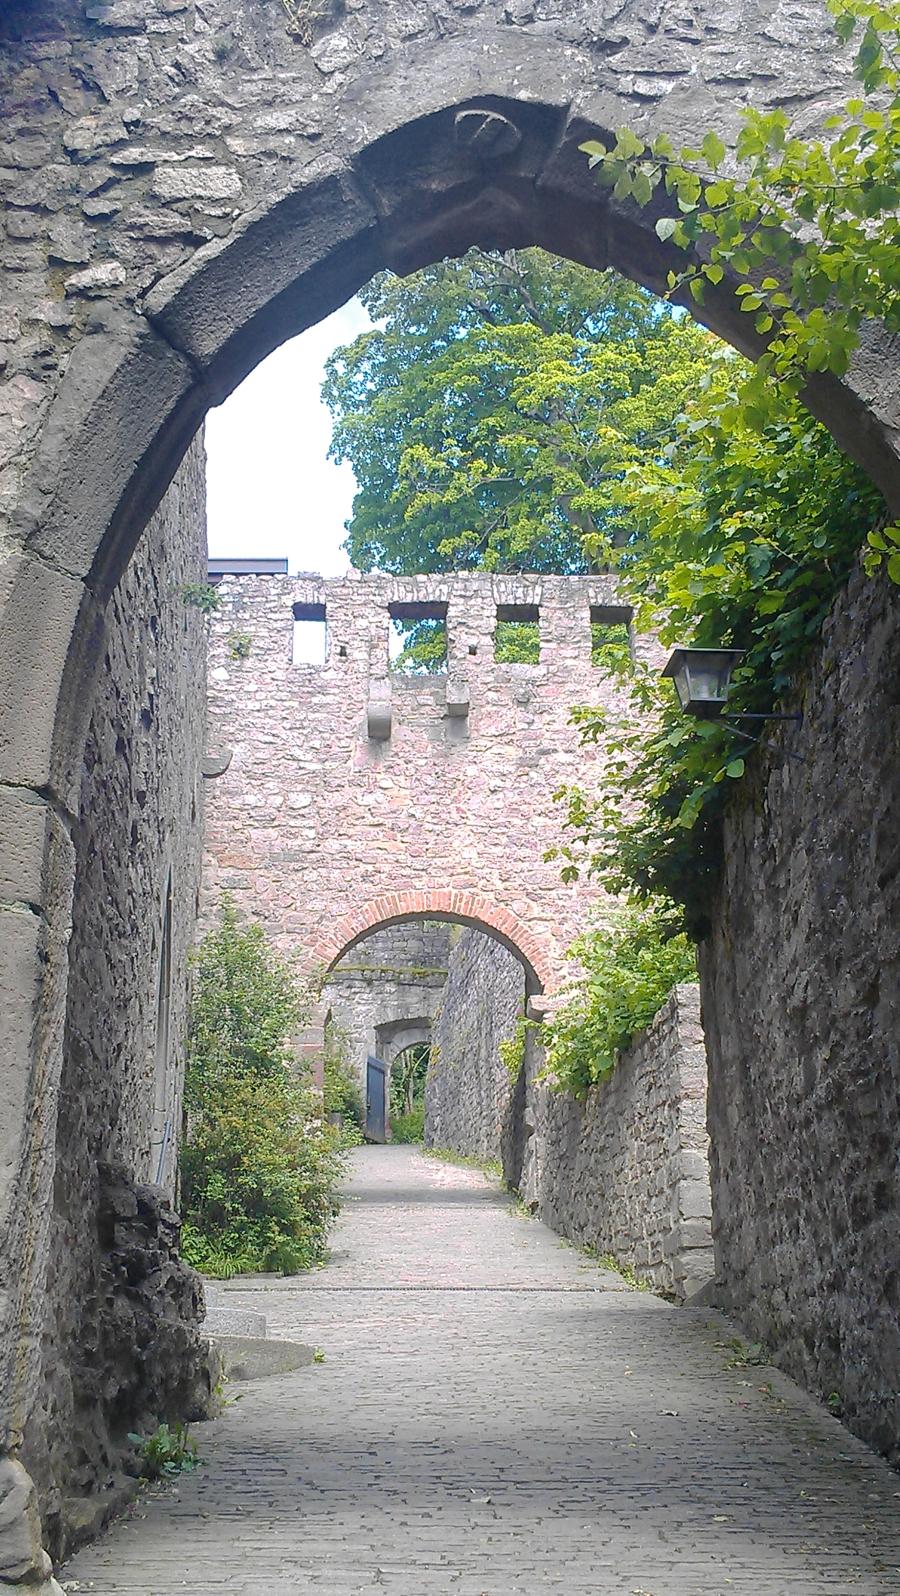 Alt-Eberstein ruins in Ebersteinburg, Germany.